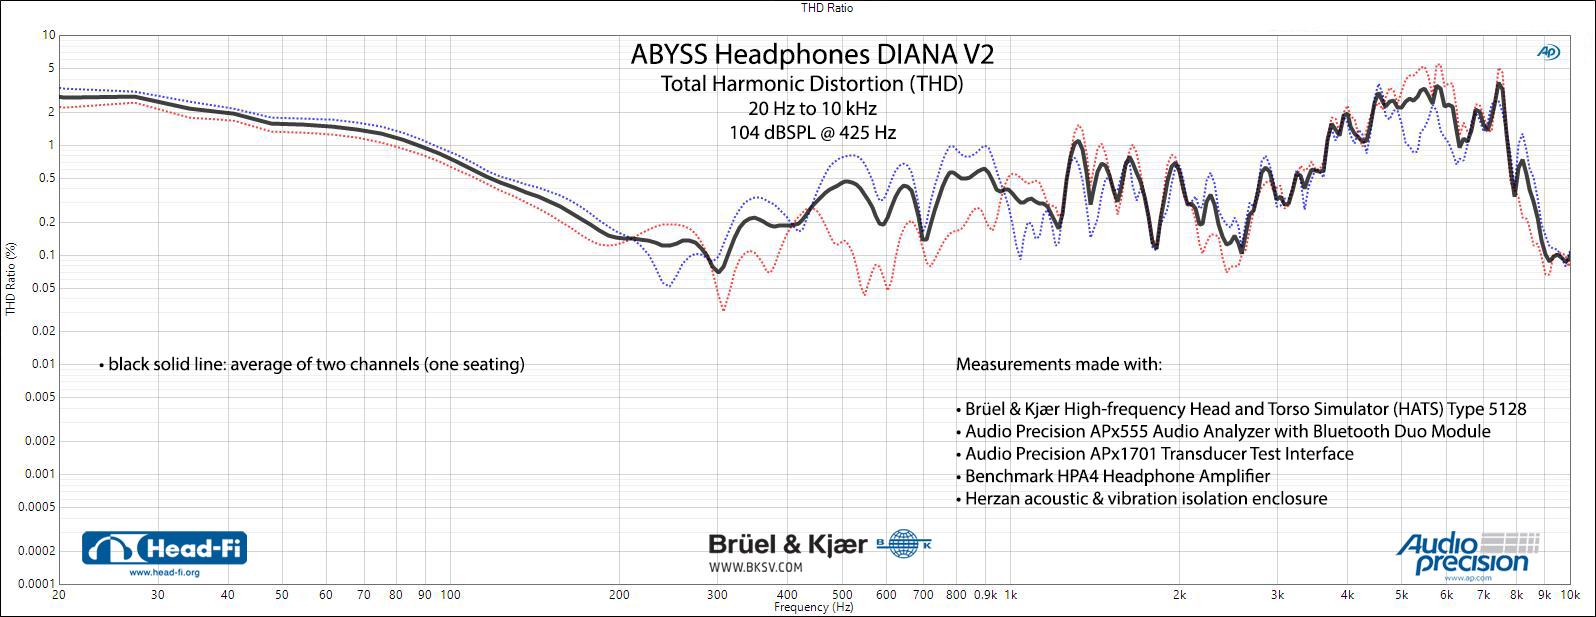 Abyss-Headphones-Diana-V2---SEAT-02---THD---104-dBSPL-425-Hz.jpg